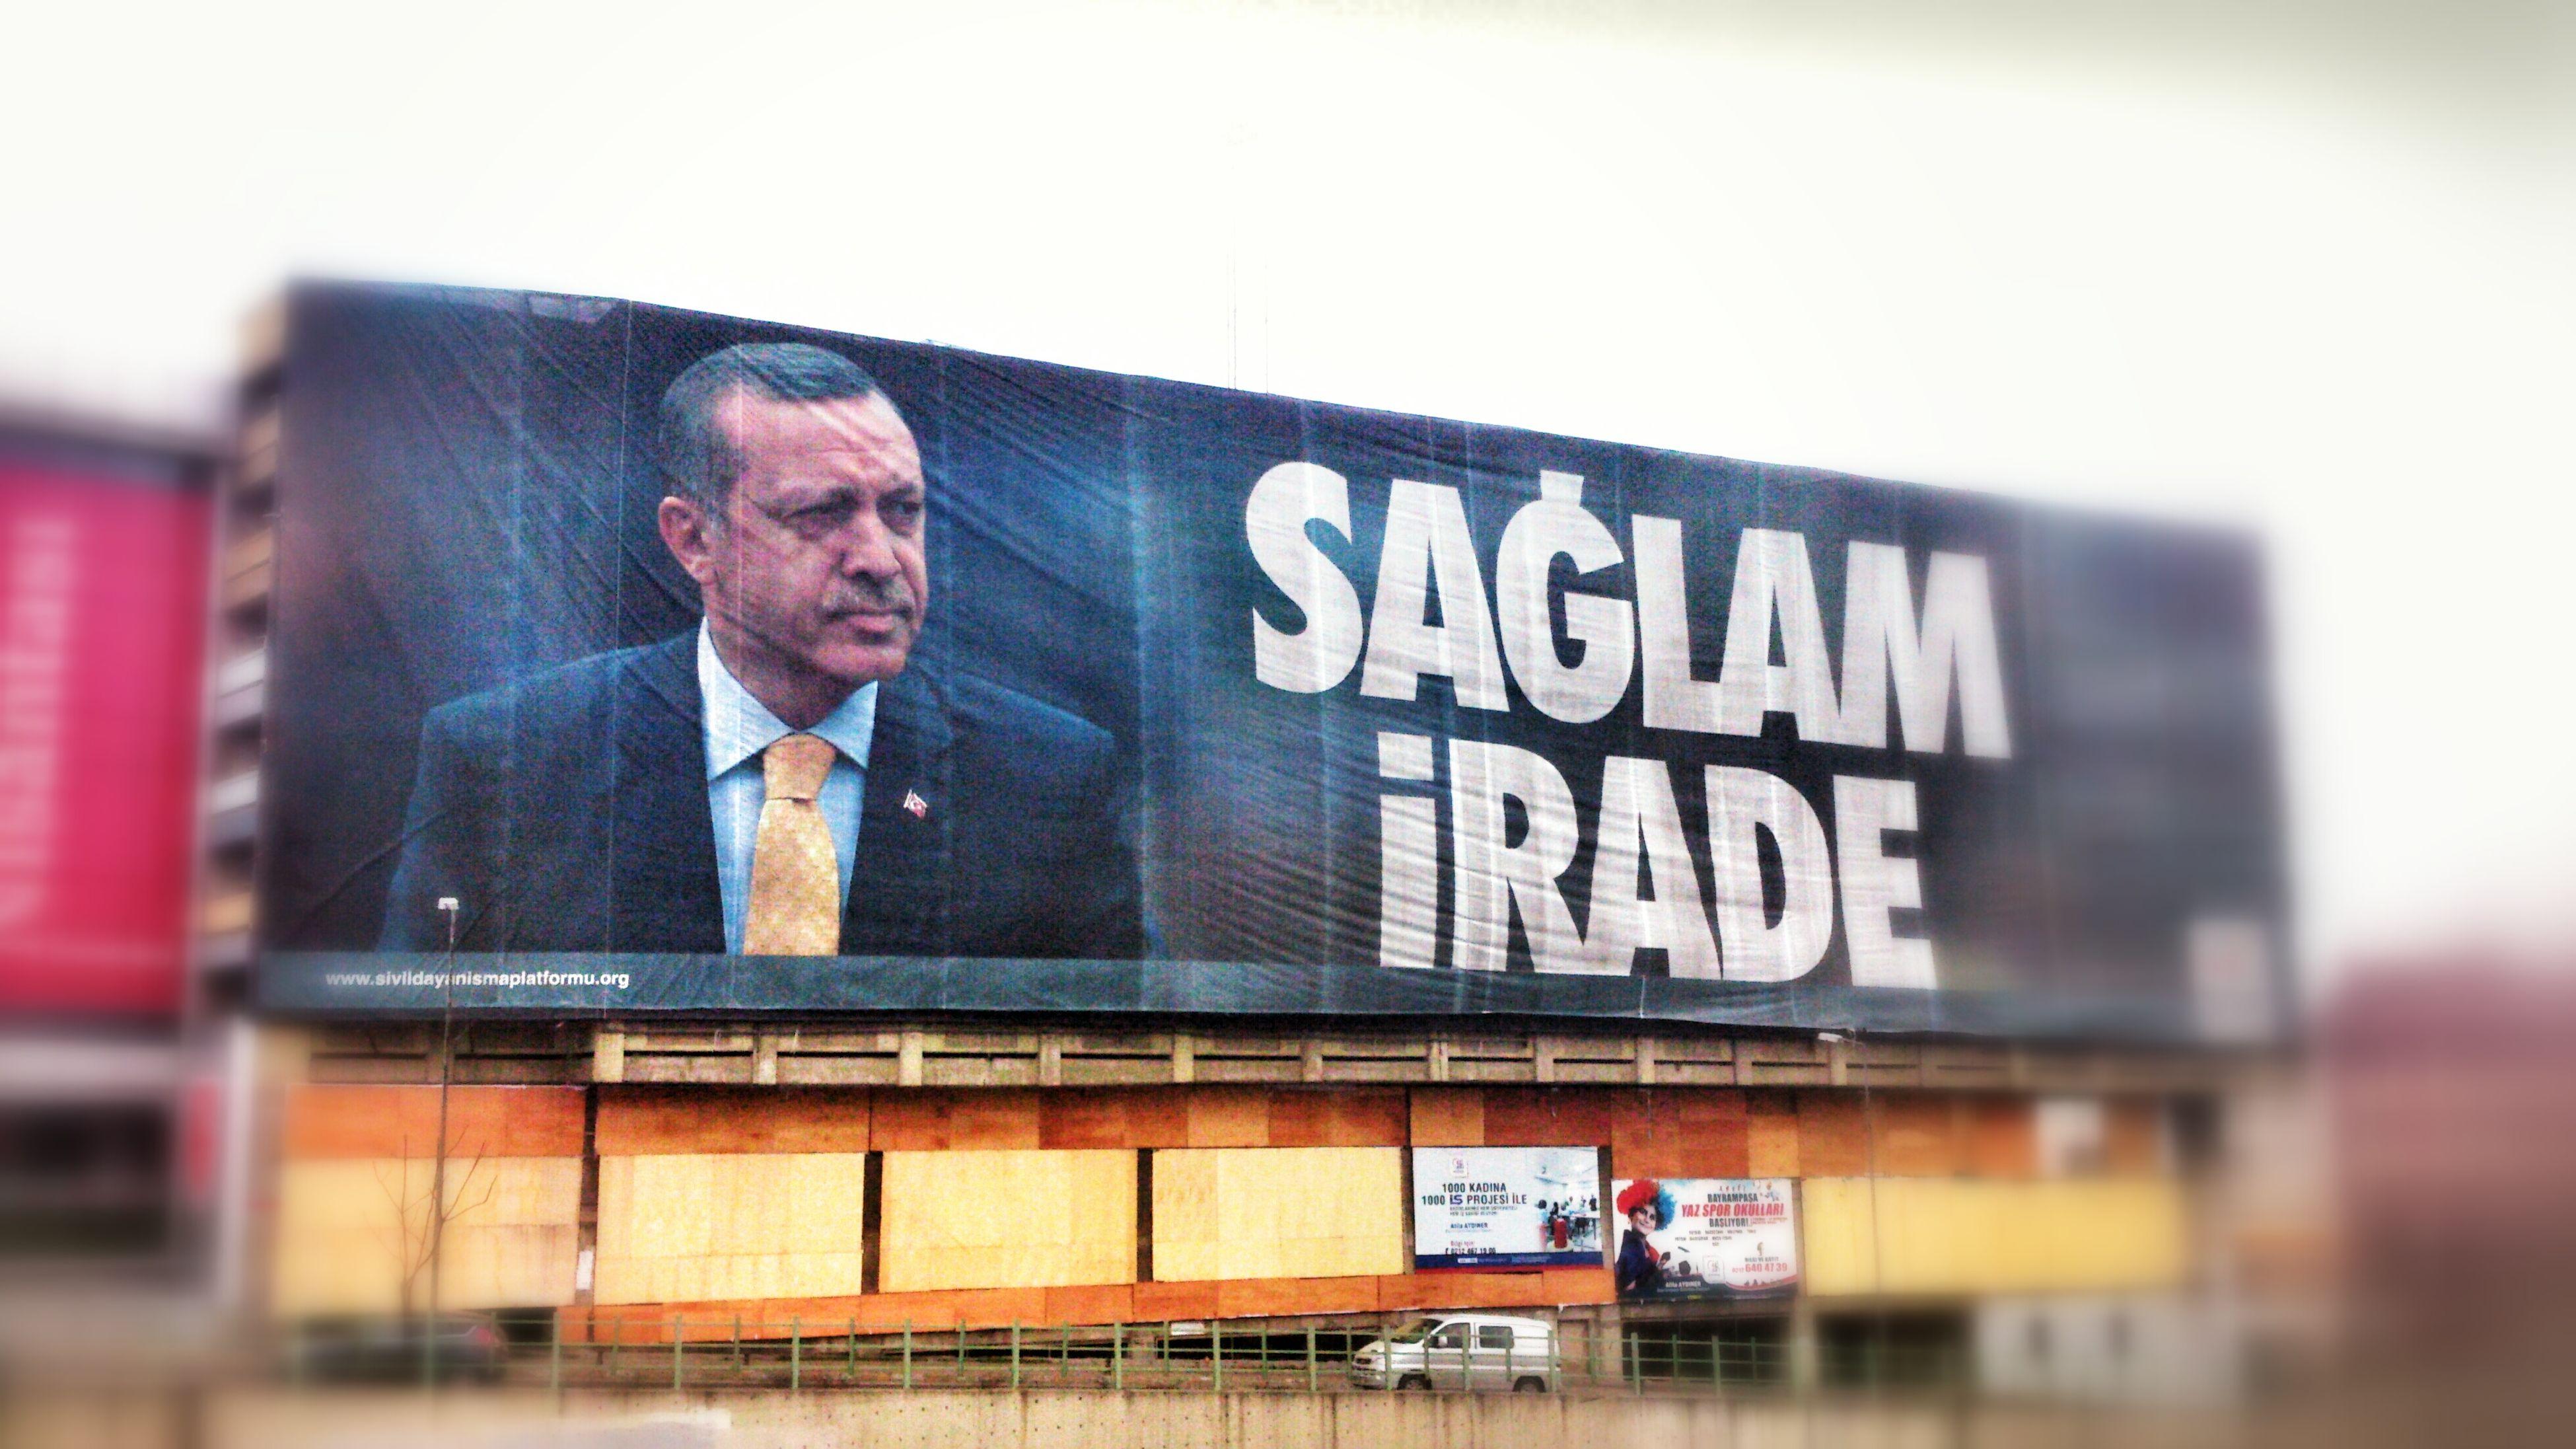 SAĞLAM İRADE :-) Recep Tayyip Erdogan RTE